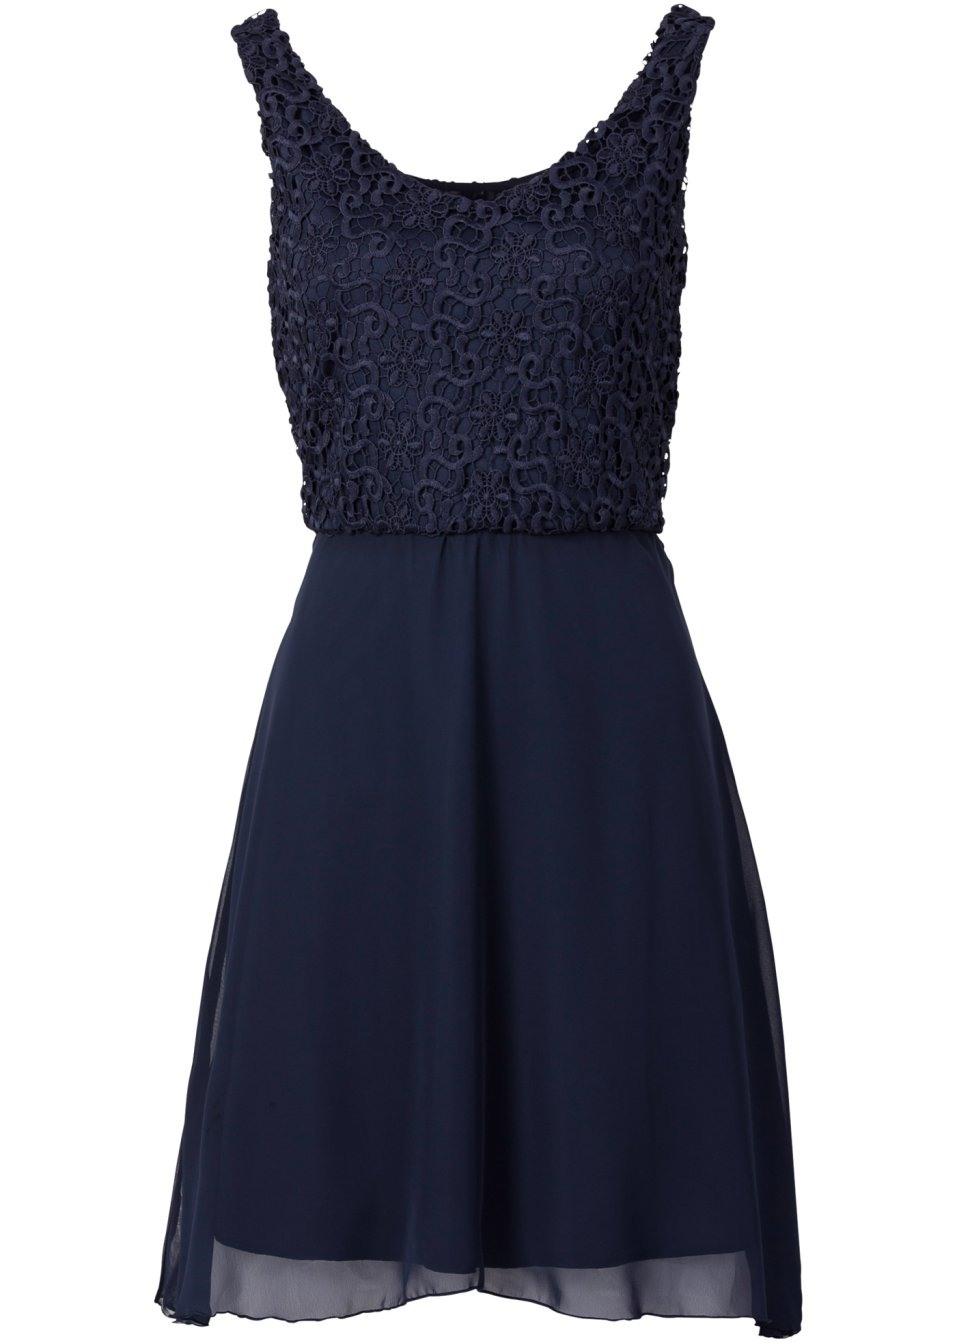 10 Fantastisch Langes Dunkelblaues Kleid VertriebAbend Leicht Langes Dunkelblaues Kleid Spezialgebiet